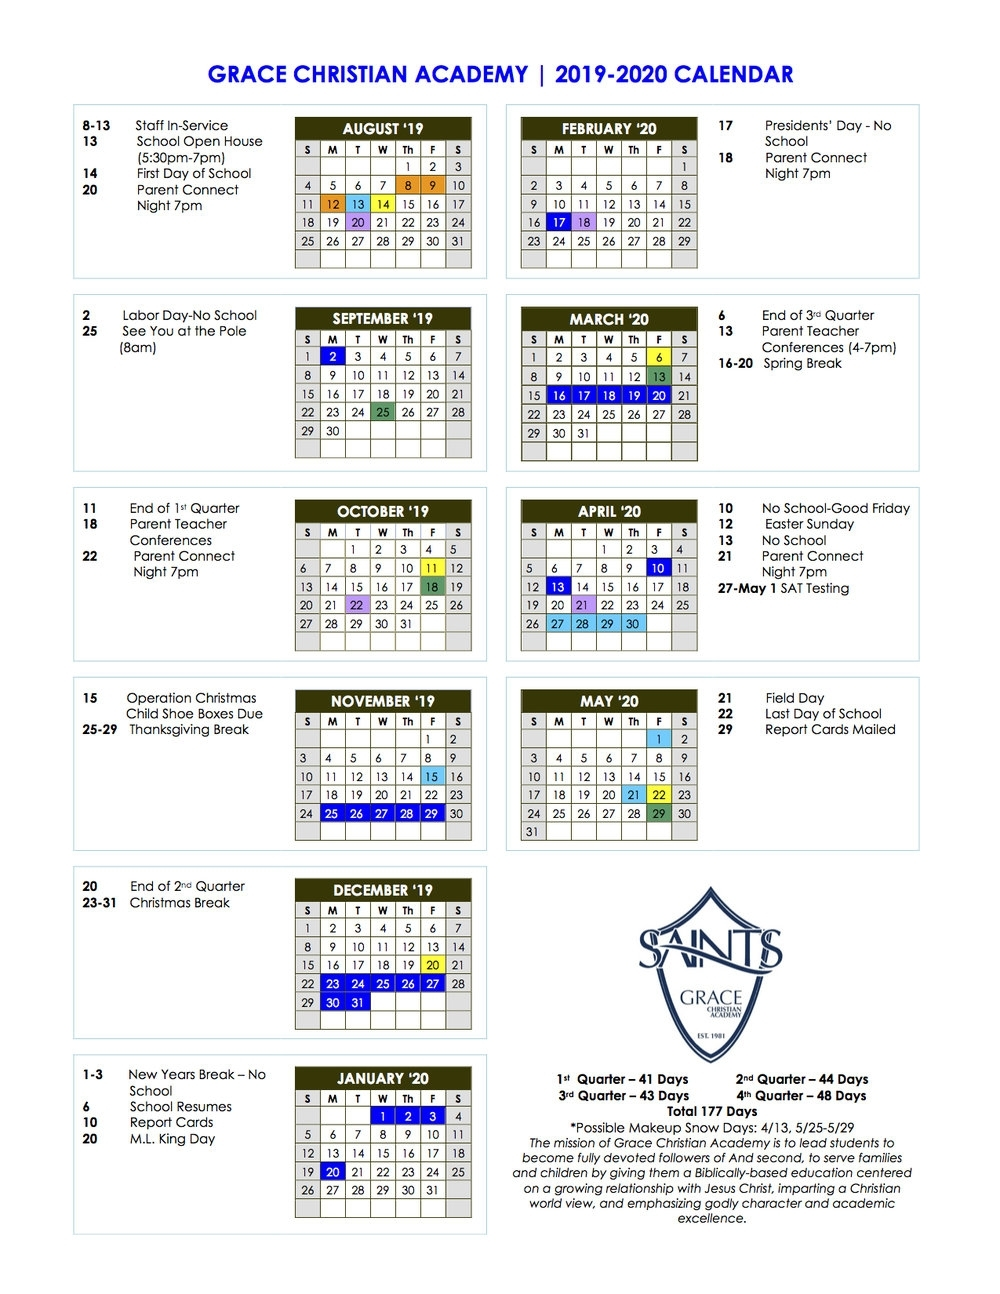 Calendar For 2019-2020 — Grace Christian Academy throughout 2019 2020 Box Calender